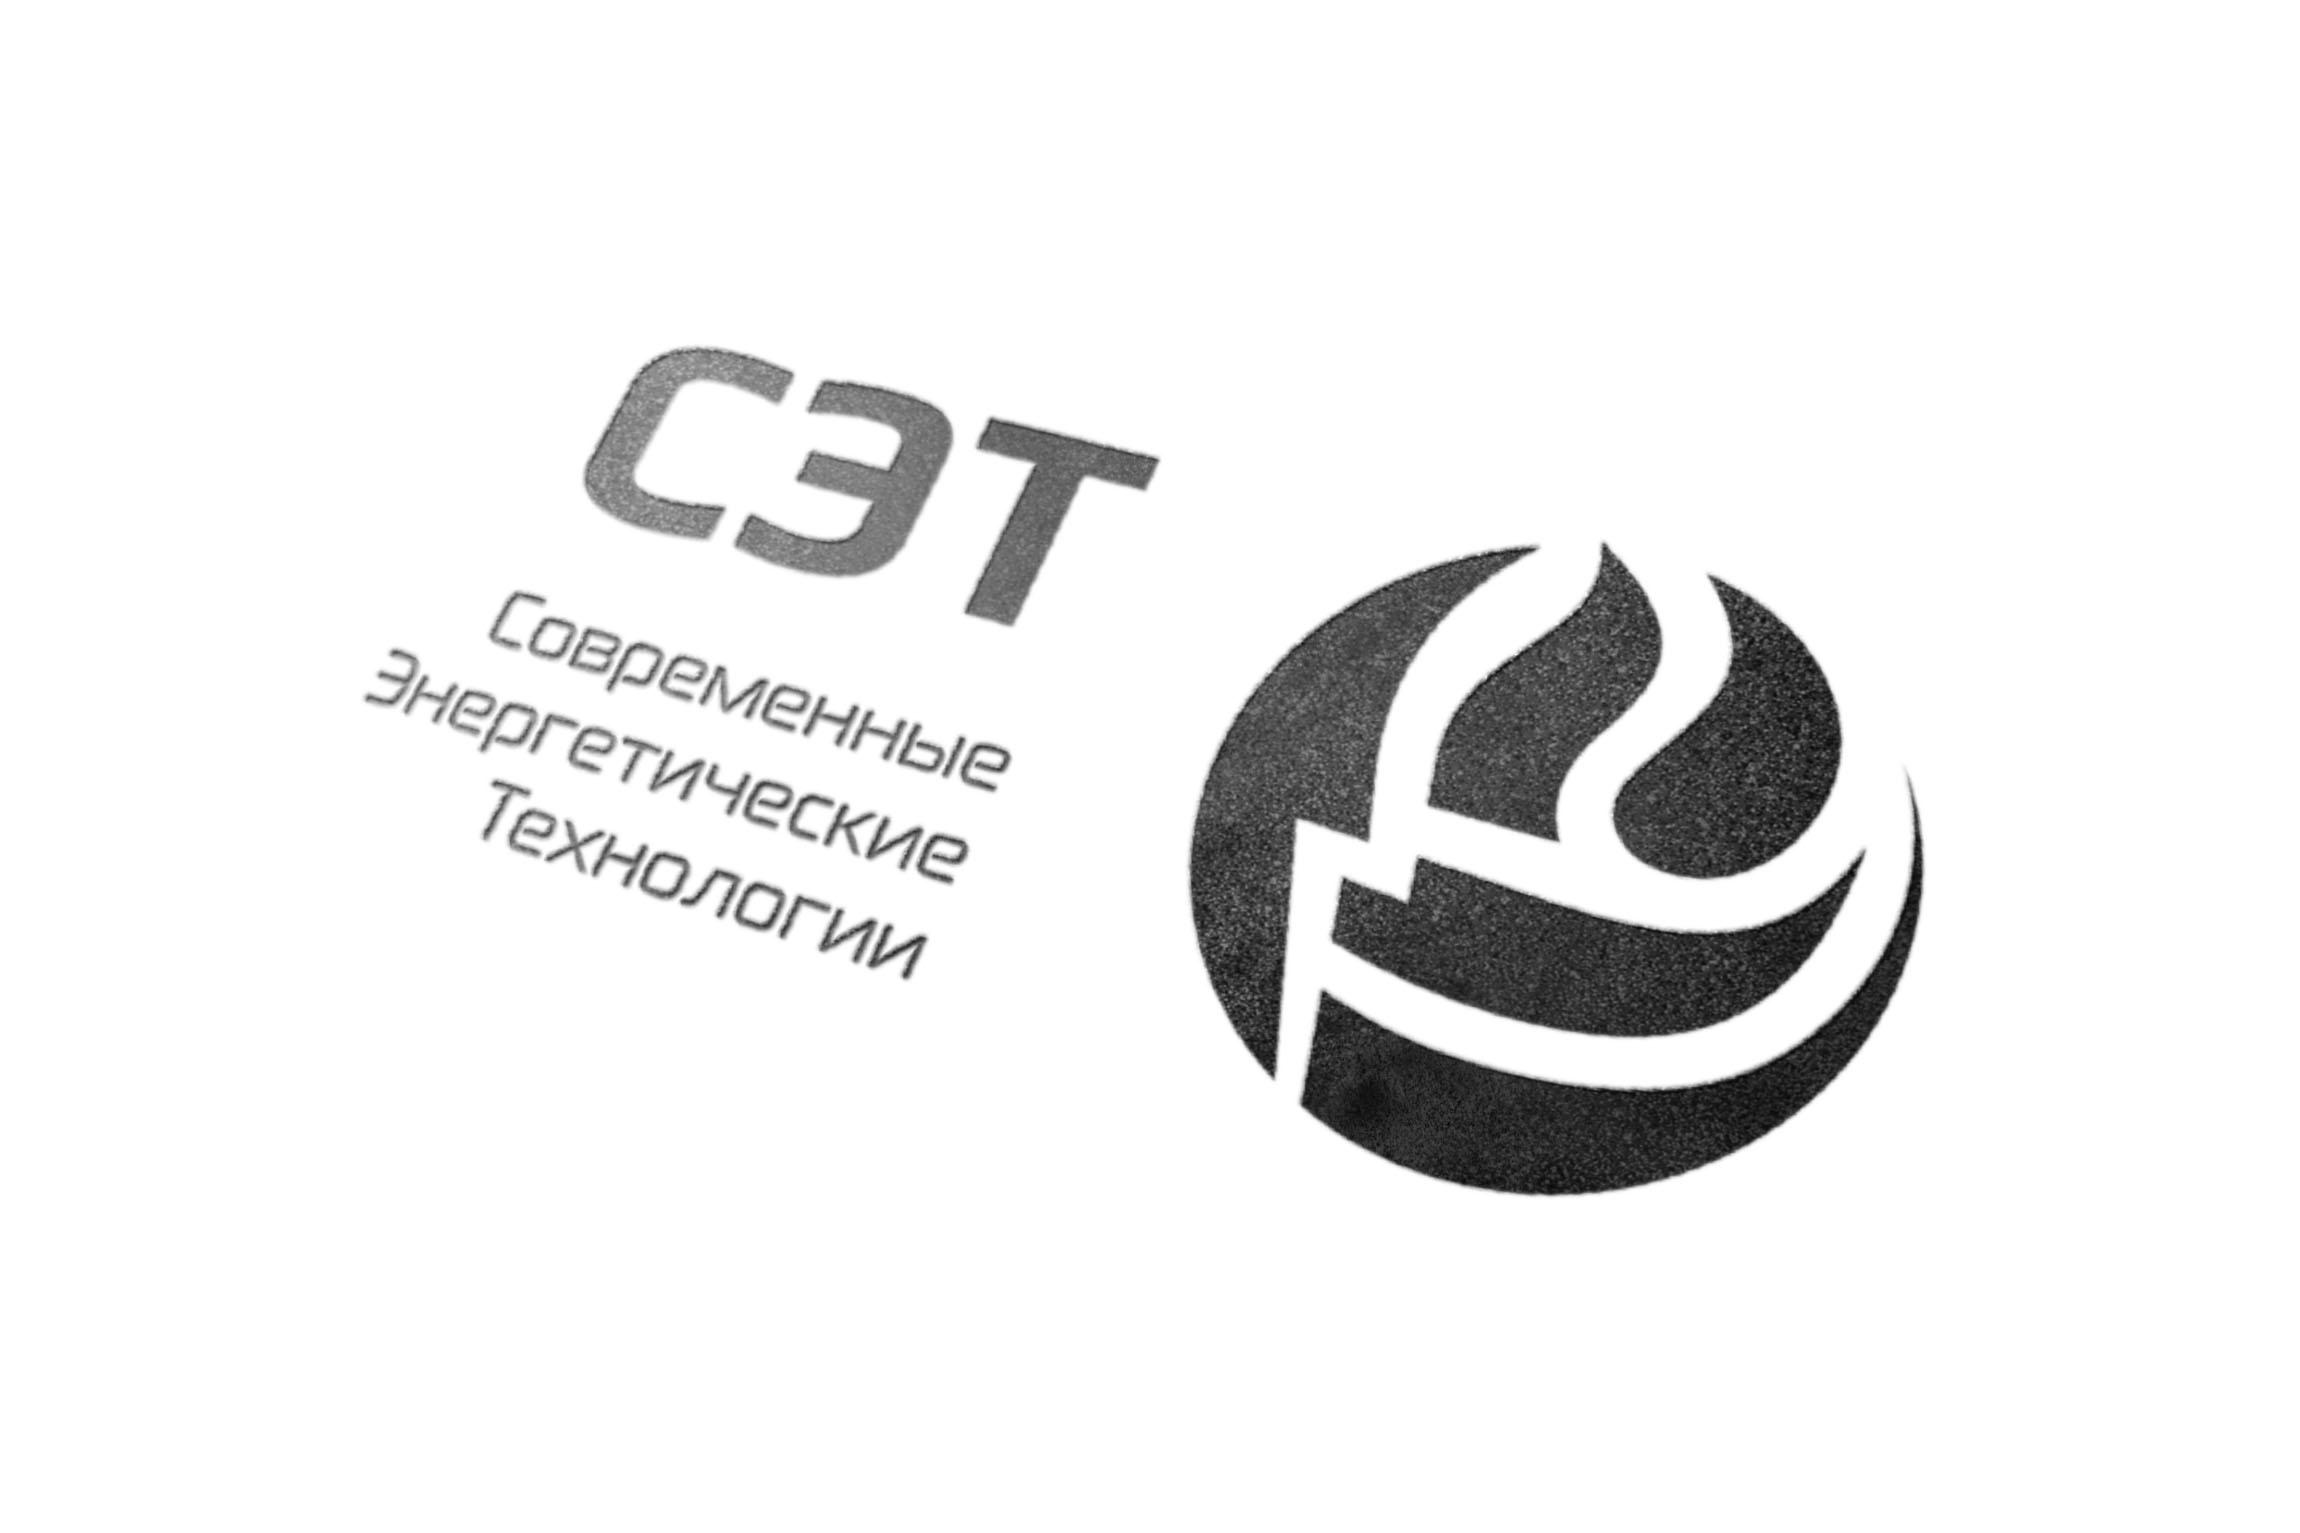 Срочно! Дизайн логотипа ООО «СЭТ» фото f_9425d52b0df41357.jpg